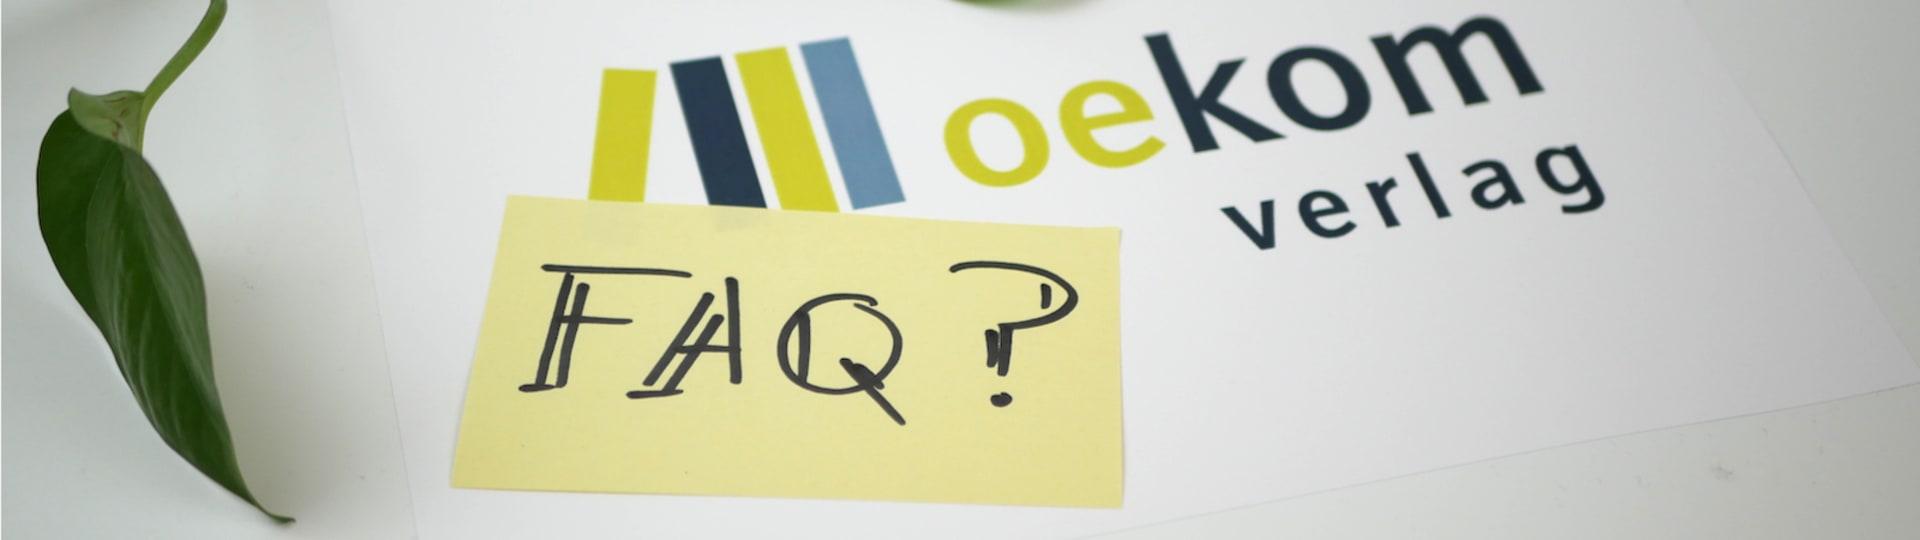 Post-it Zettel mit Aufschrift »FAQ?«